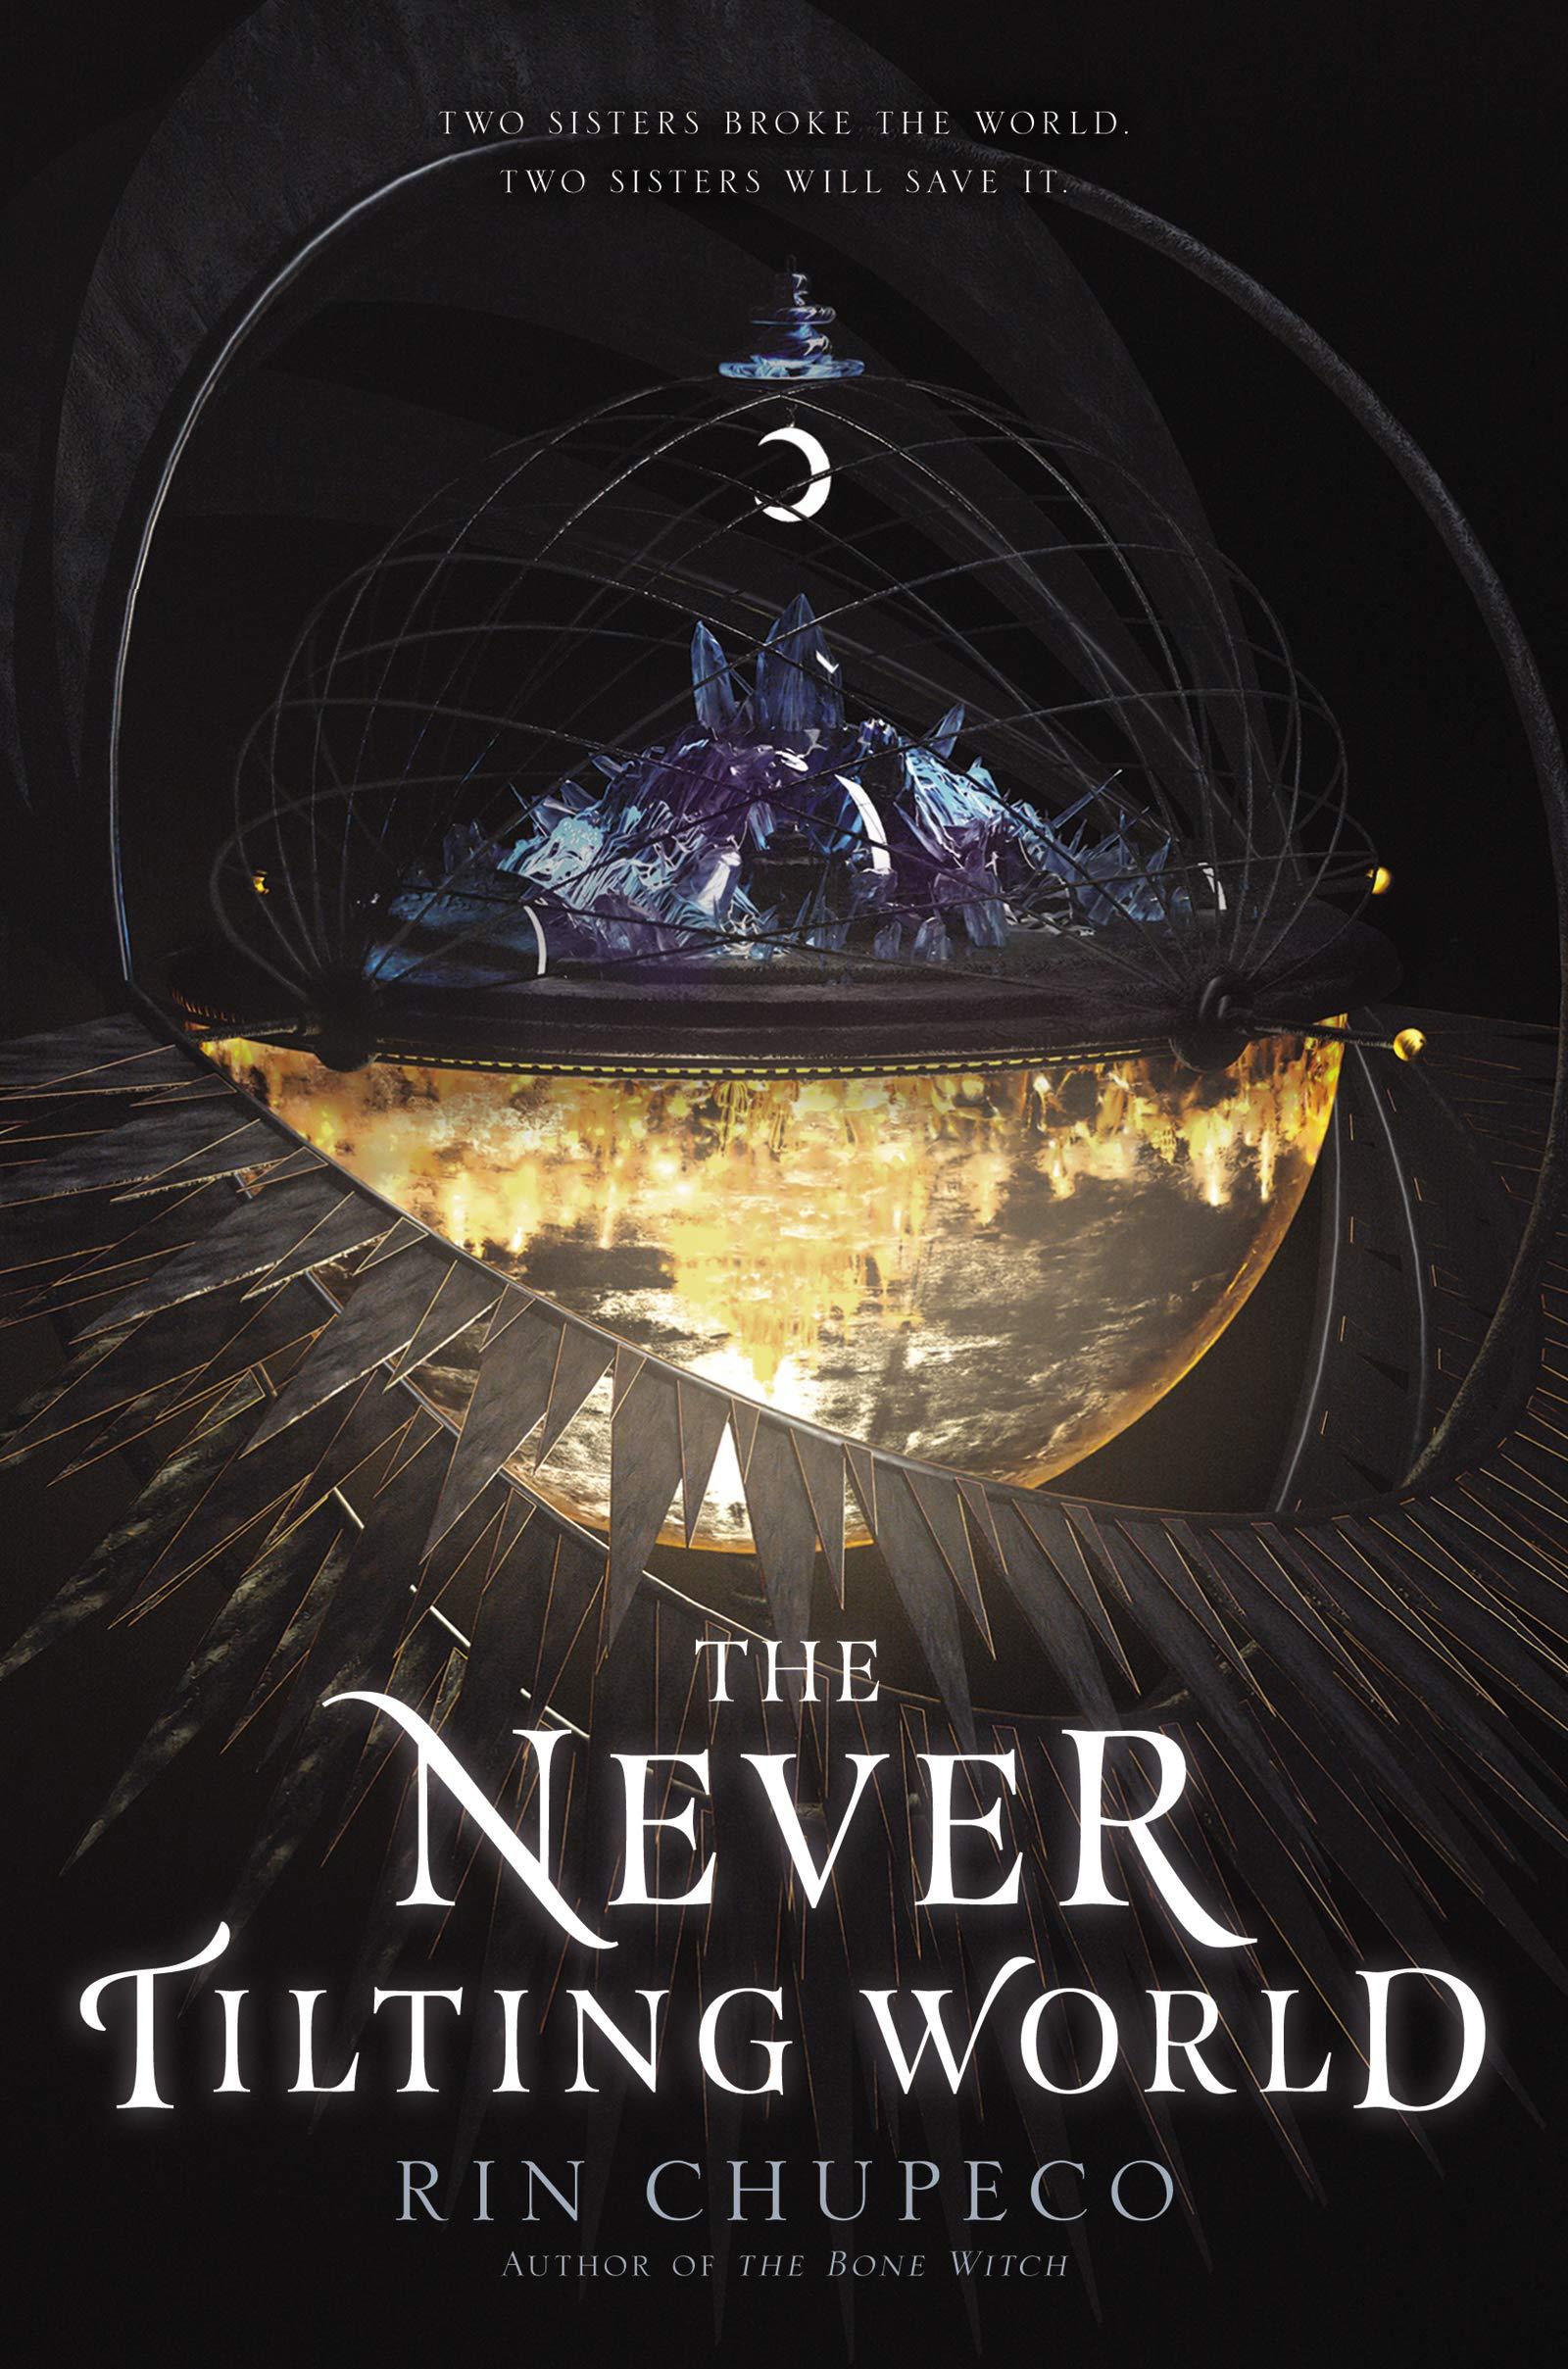 Amazon.com: The Never Tilting World (Never Tilting World, 1)  (9780062821799): Chupeco, Rin: Books